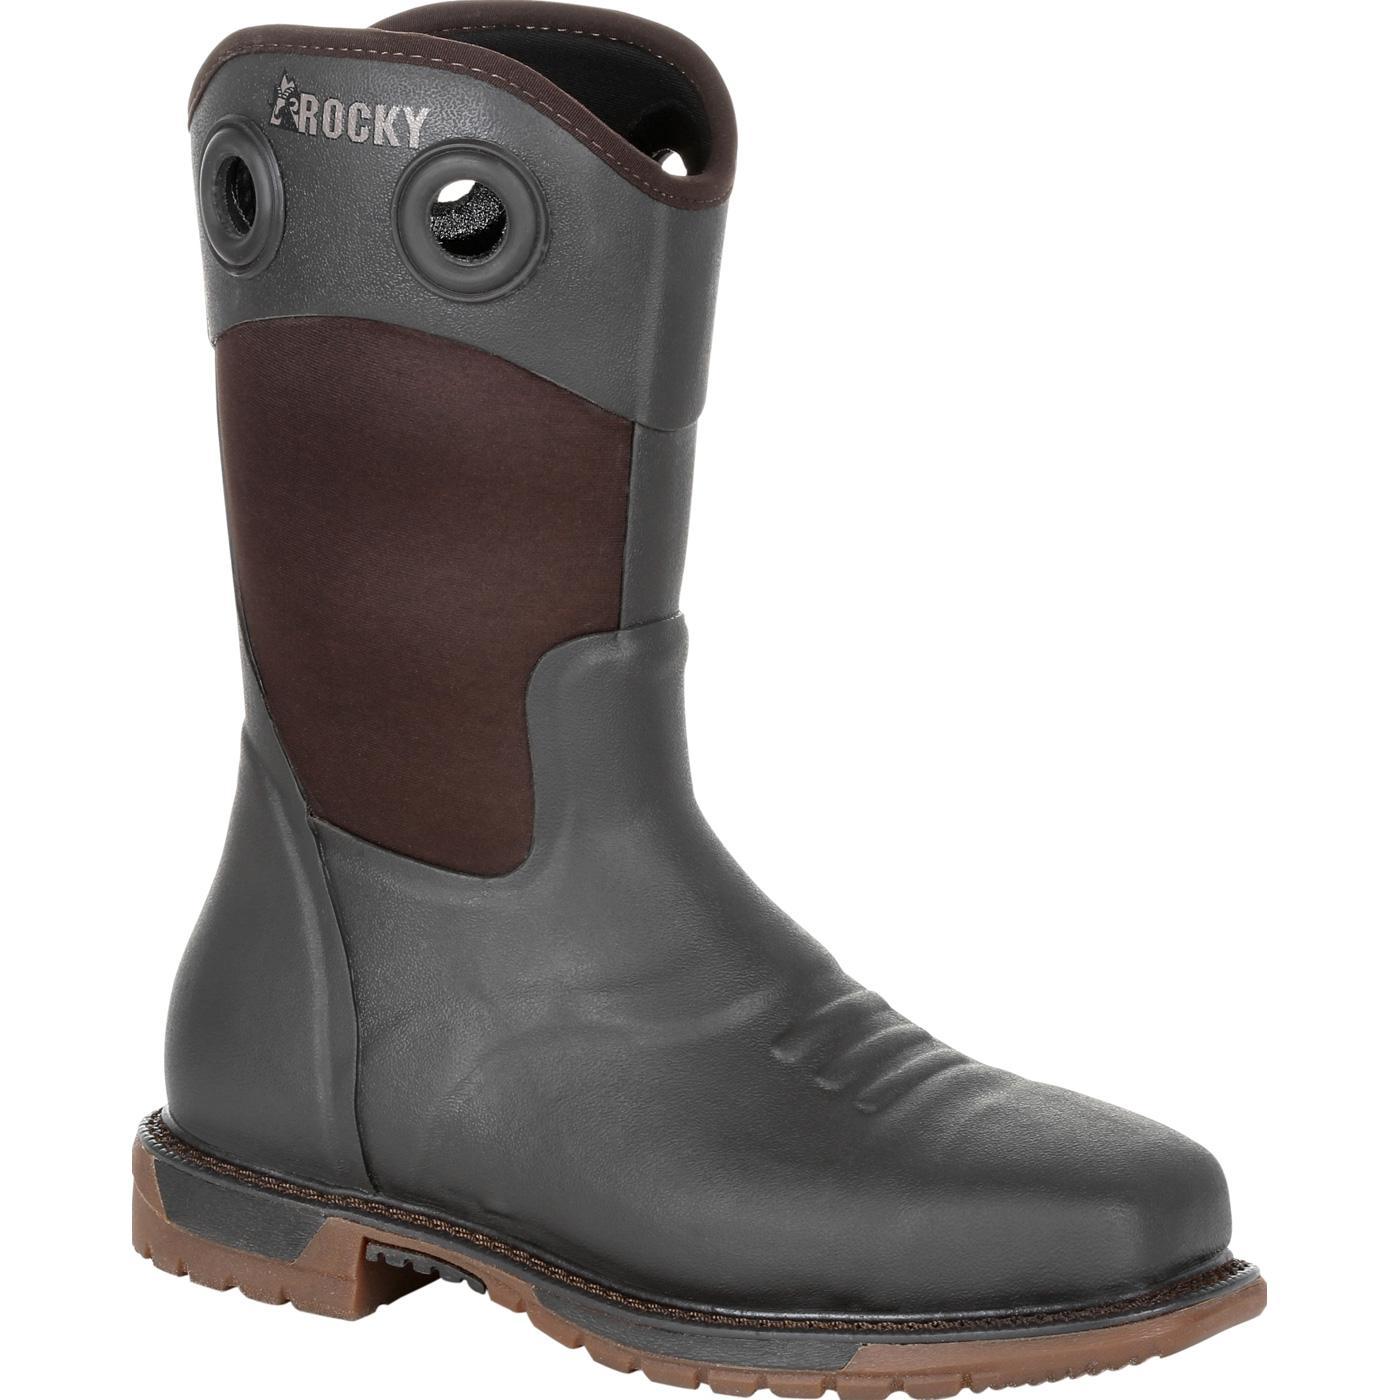 c89fe1f1b2d Rocky Original Ride FLX Women's Rubber Boot